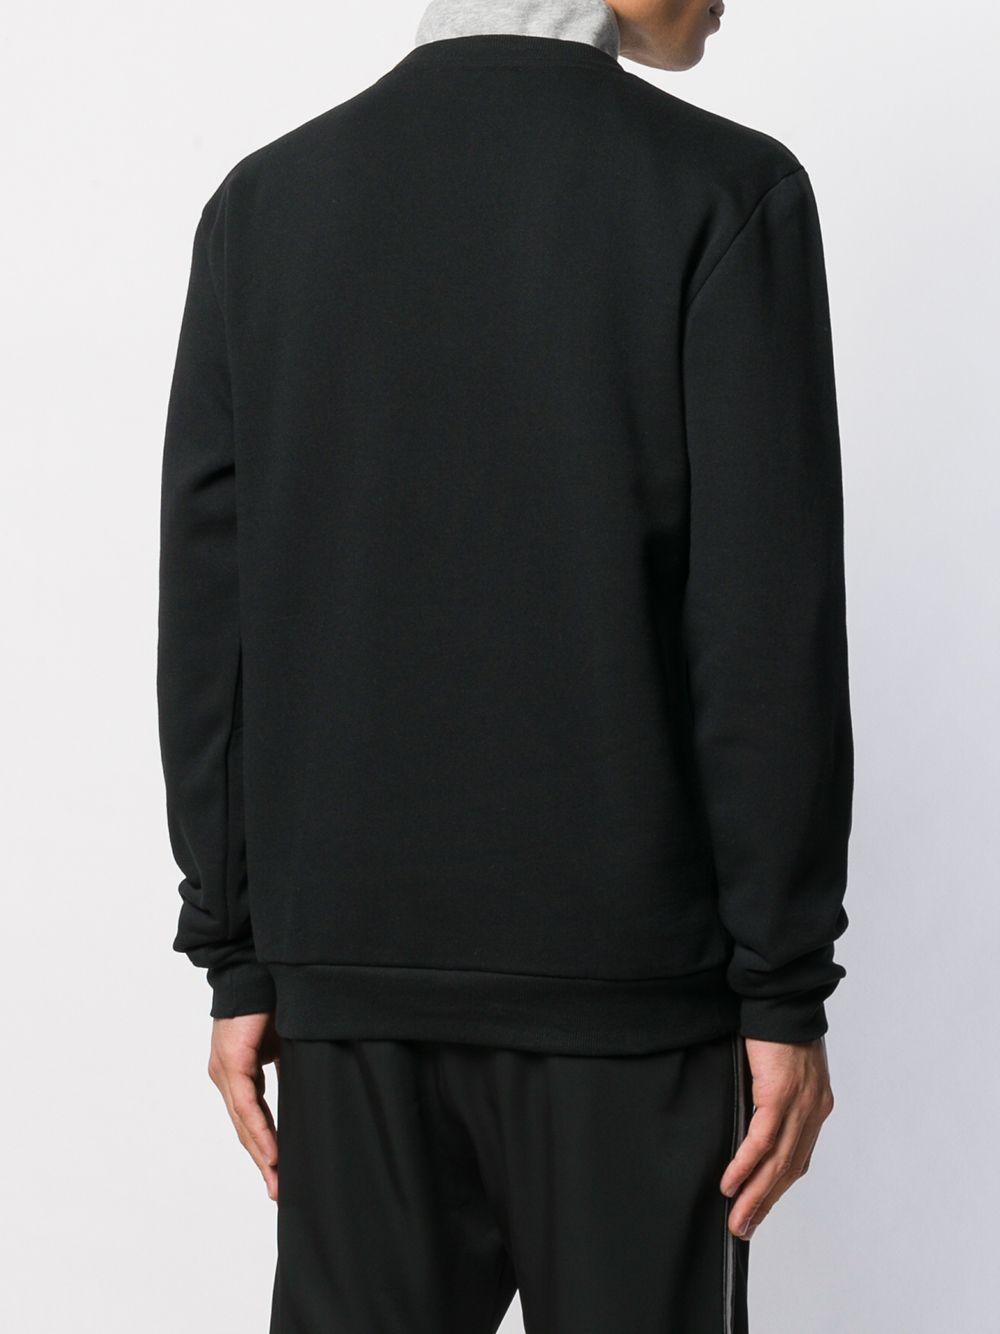 1017 Alyx 9sm logo sweatshirt unisex black 1017 ALYX 9SM | Sweatshirts | AVUSW0011FA01BLK001